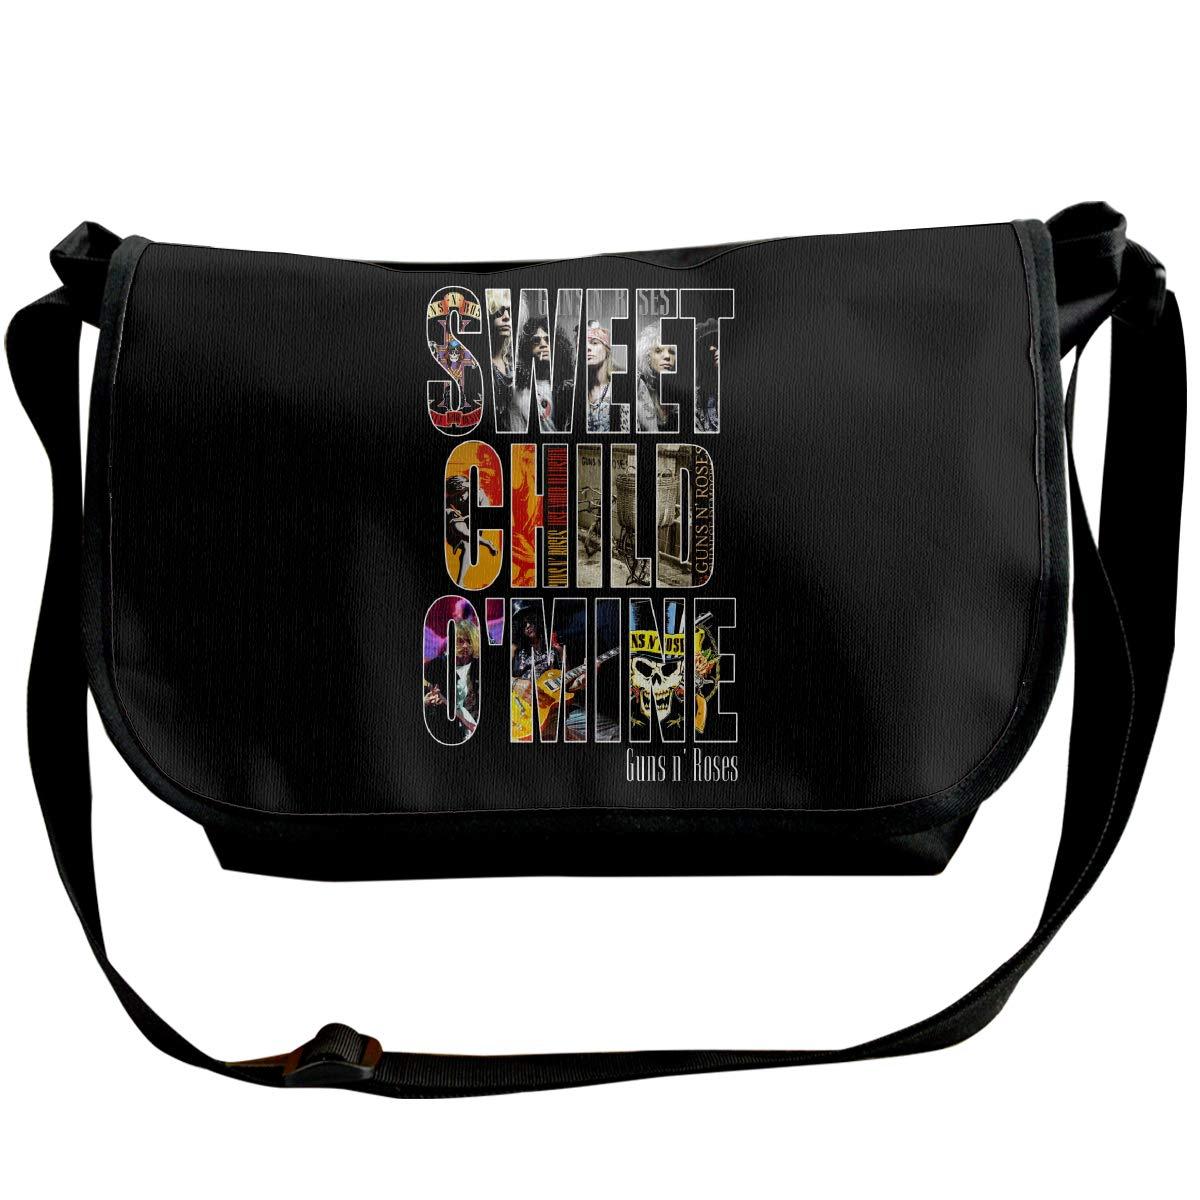 Classic Guns NRoses-Sweet Child Omine Messenger Bag Shoulder Bag For All-Purpose Use